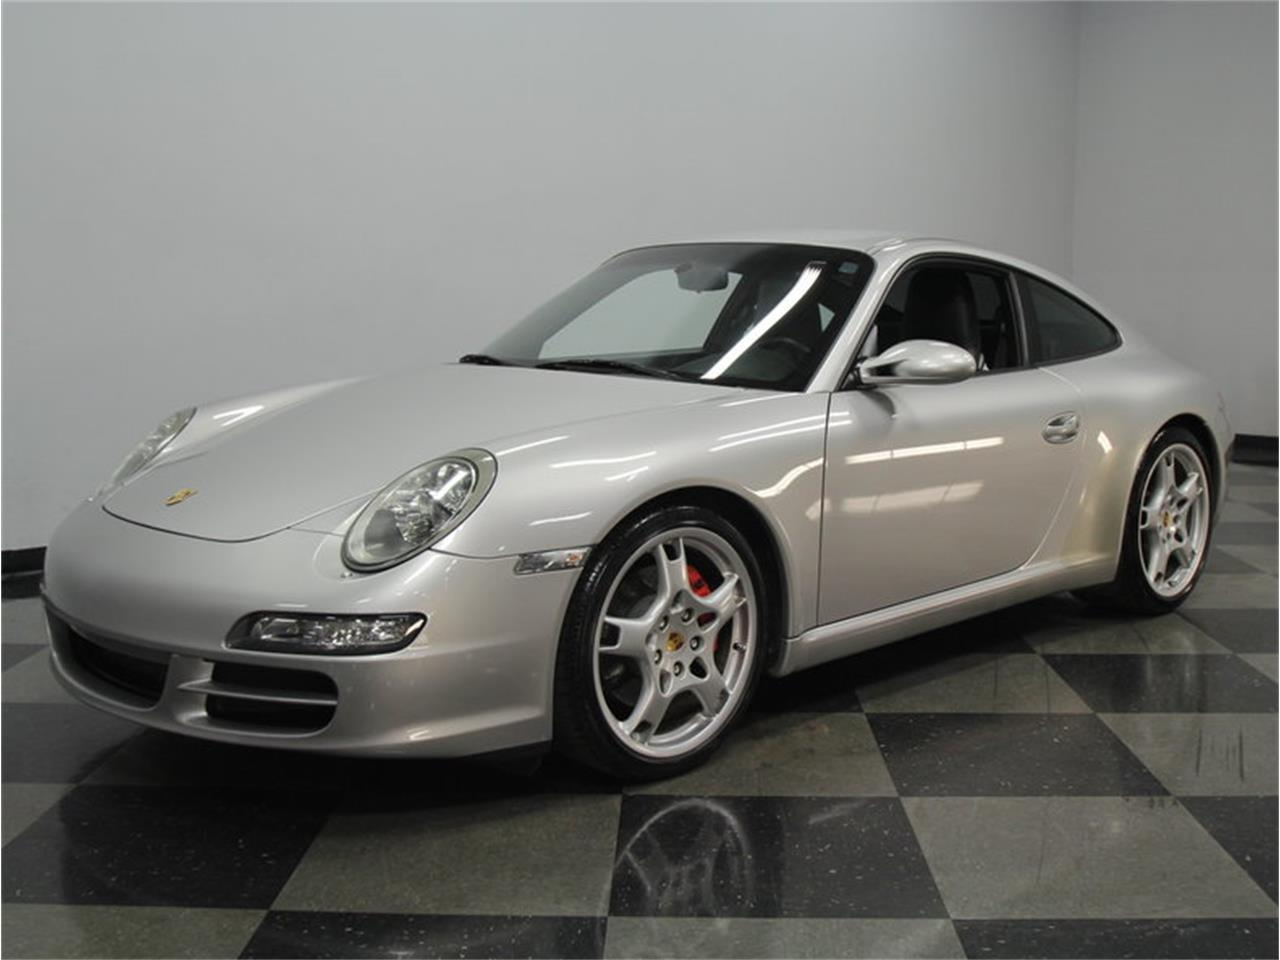 2005 Porsche 911 Carrera S For Sale Classiccars Com Cc 769854